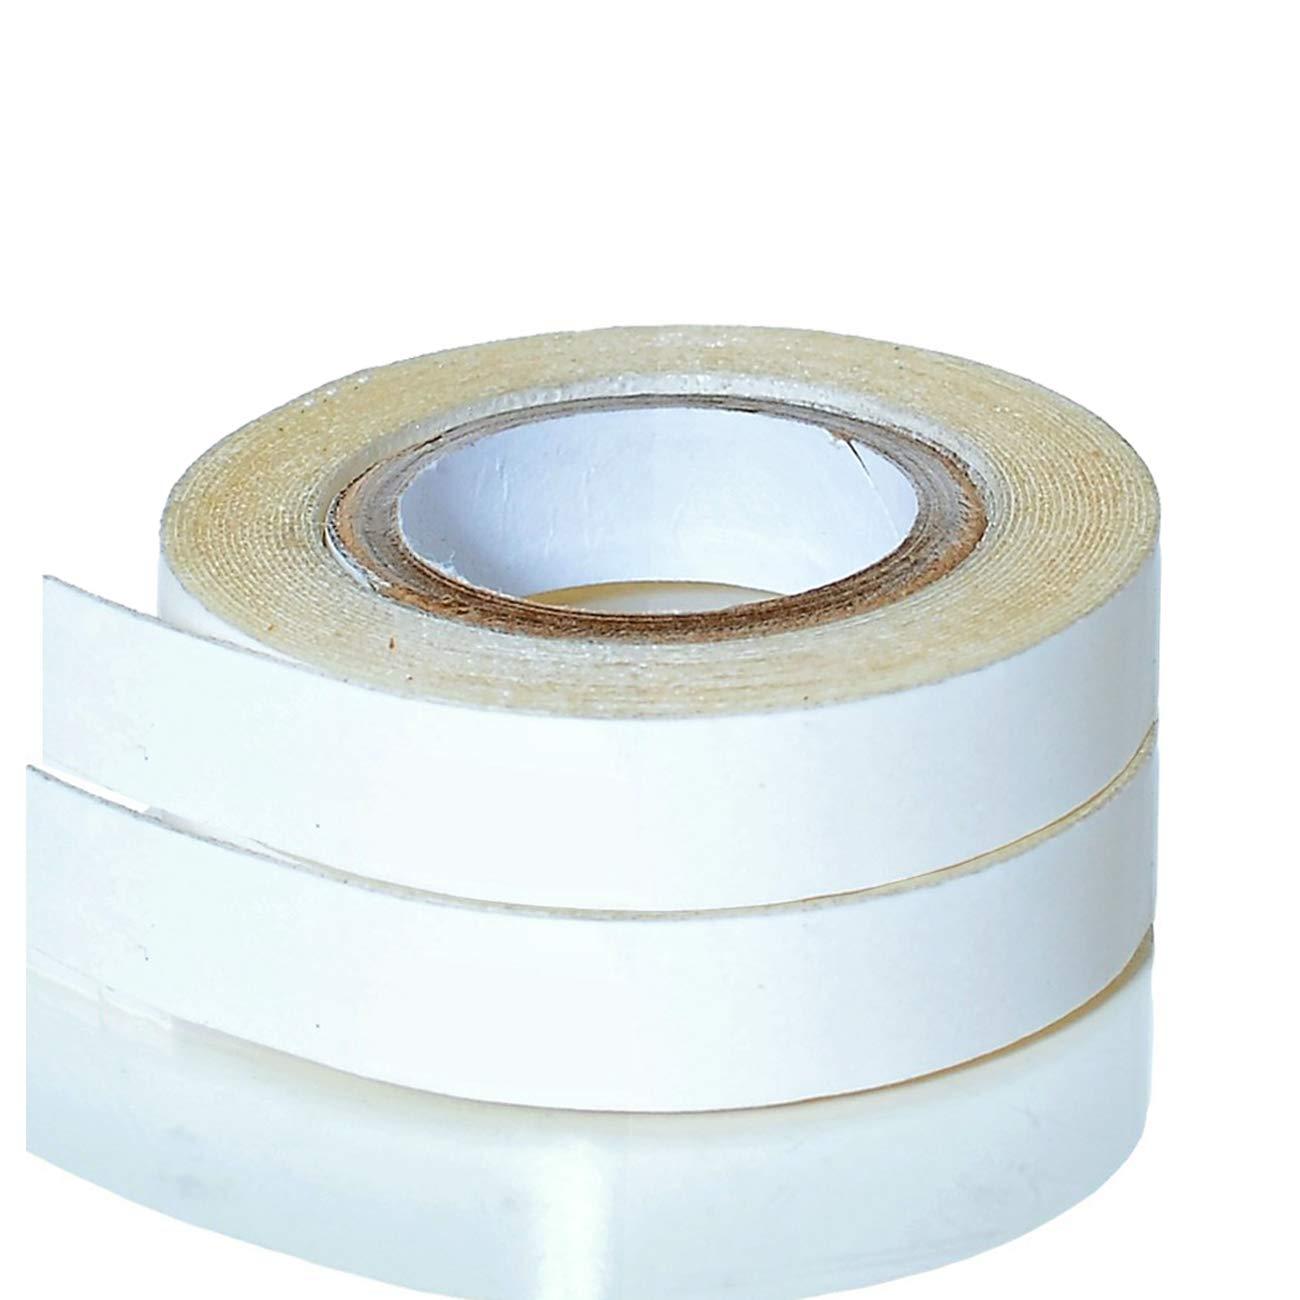 Klebeband Ersatztape fü r Tape Extensions | Neuste Klebekraft Formel | Doppelseitige Kleberolle Transparent - 2 Rollen LCP Hairproducts